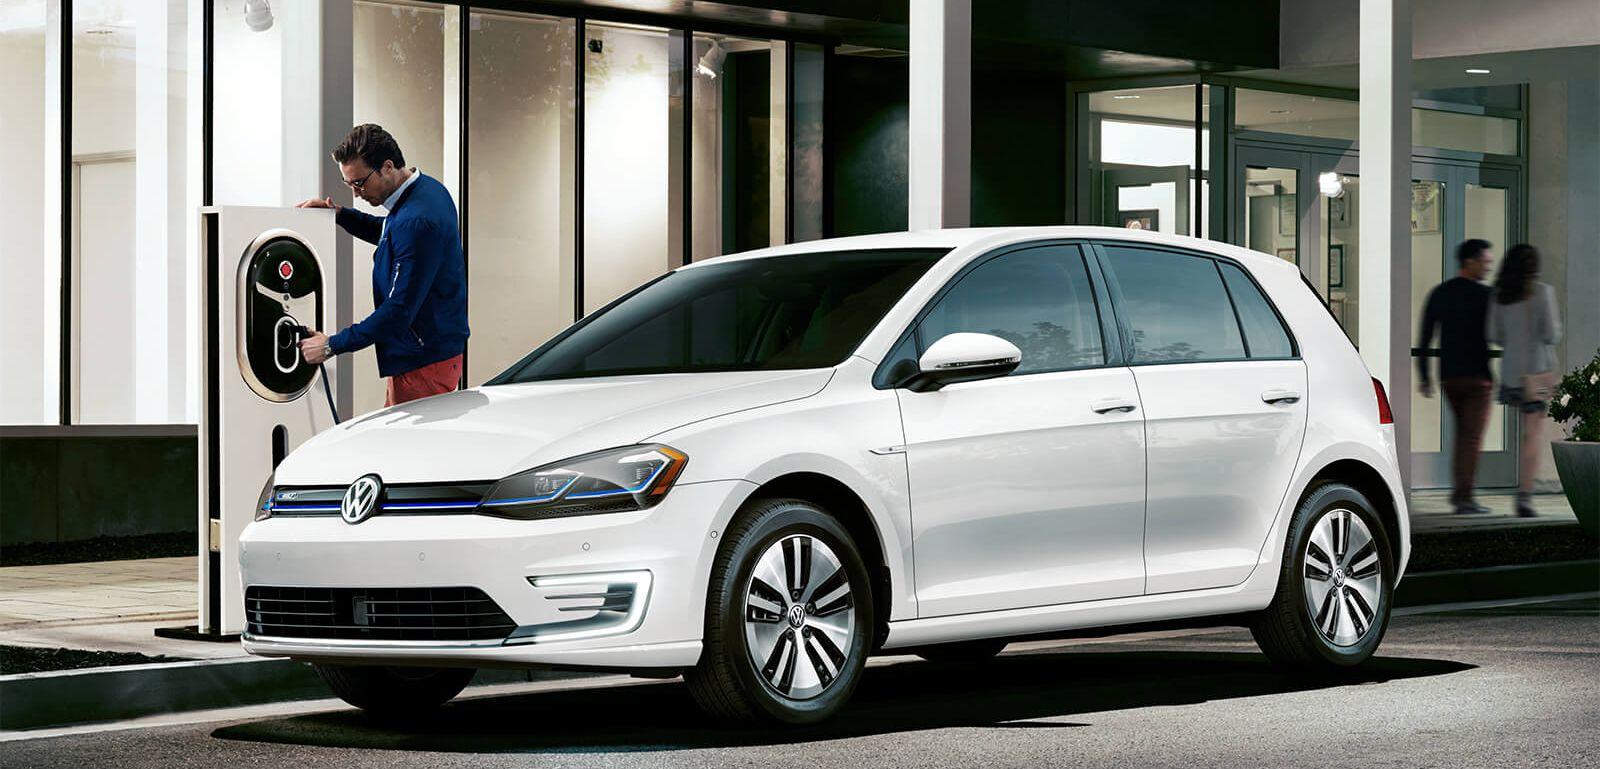 2019 Volkswagen e-Golf Leasing near Washington, DC